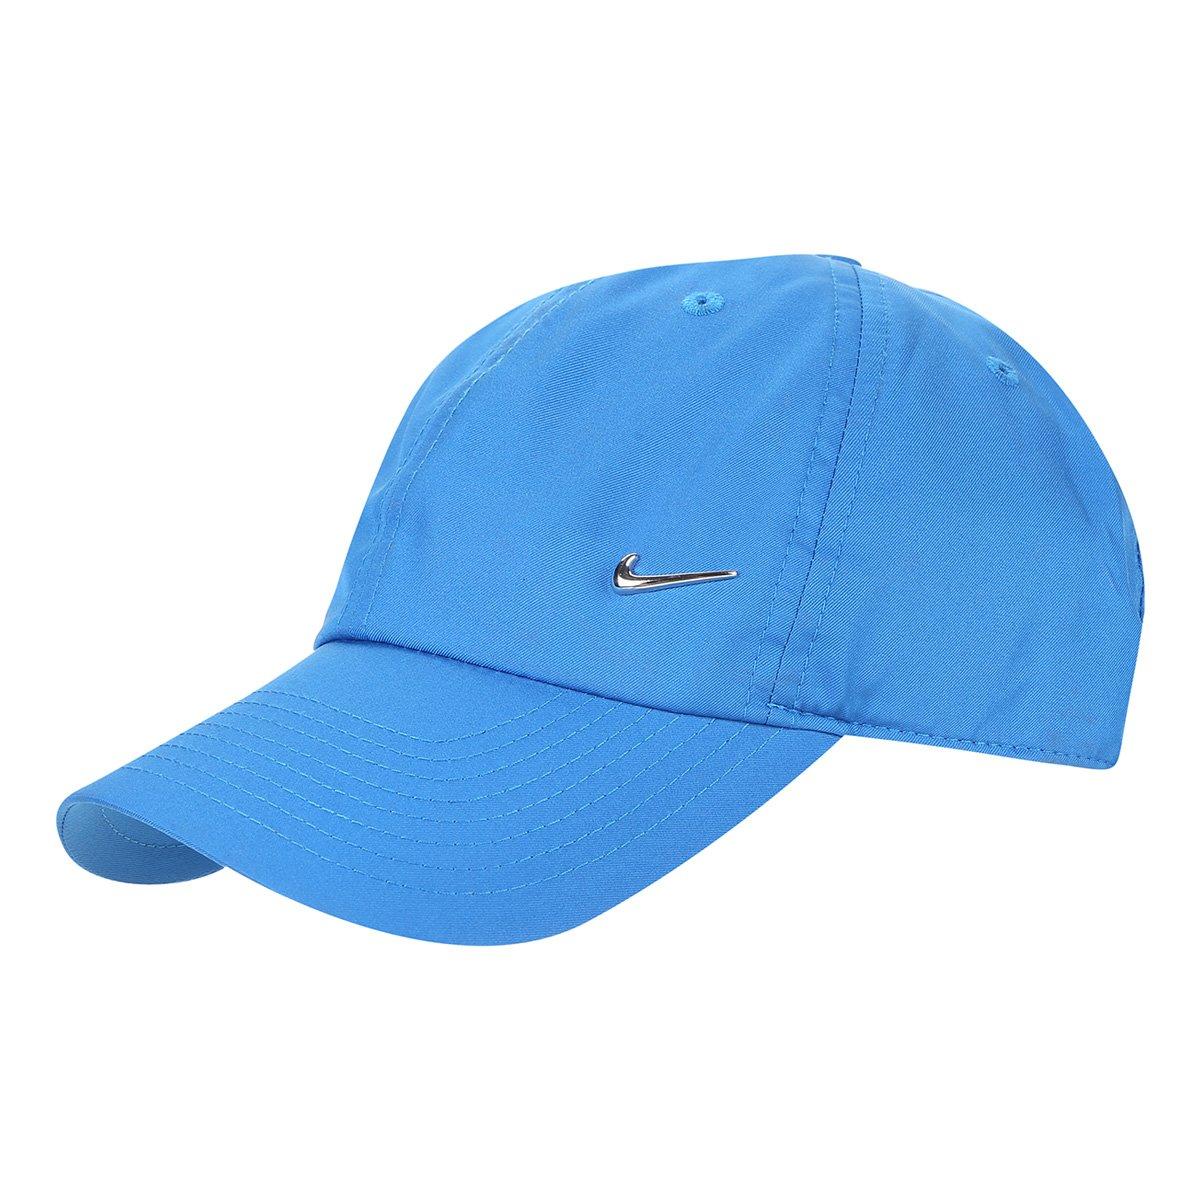 Boné Nike Aba Curva H86 Metal Swoosh - Azul - Compre Agora  ffbd44f5ad5